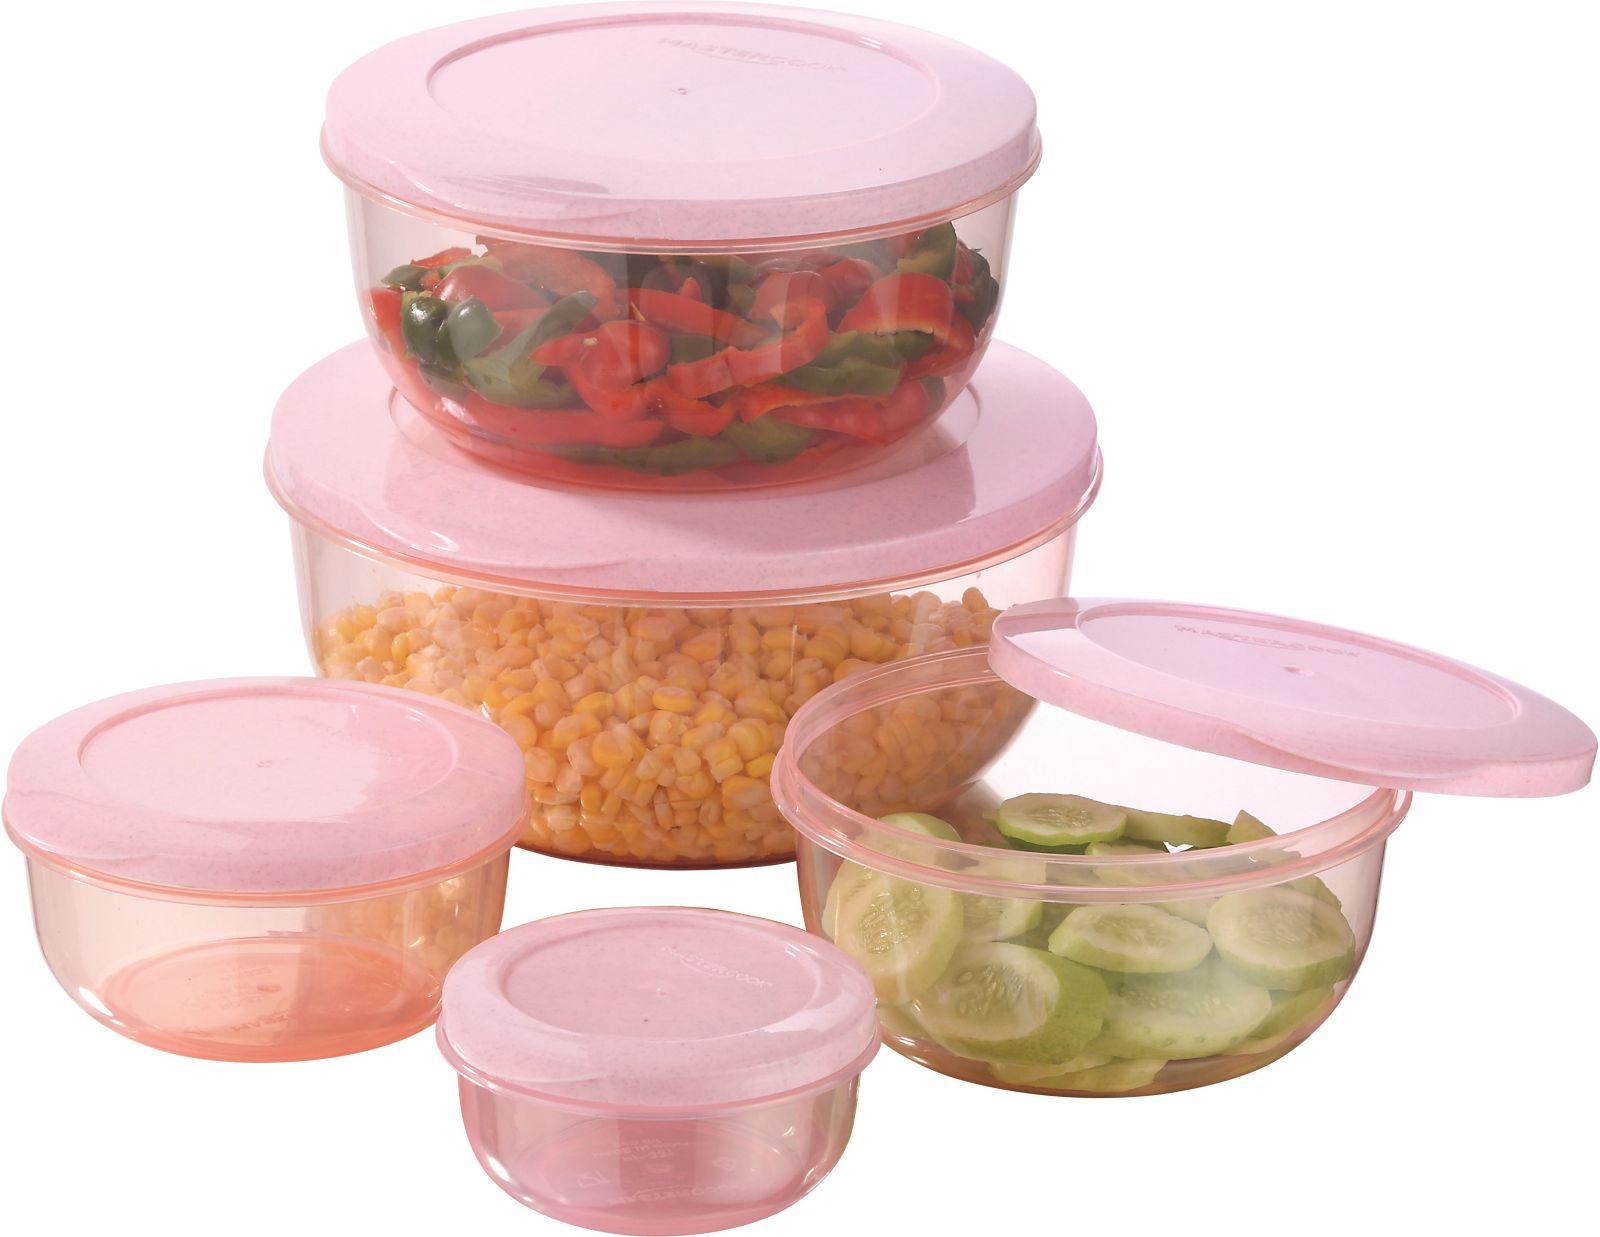 MasterCook - 290 ml, 580 ml, 1000 ml, 1700 ml, 2700 ml Plastic Grocery Container (Pack of 5, Orange)